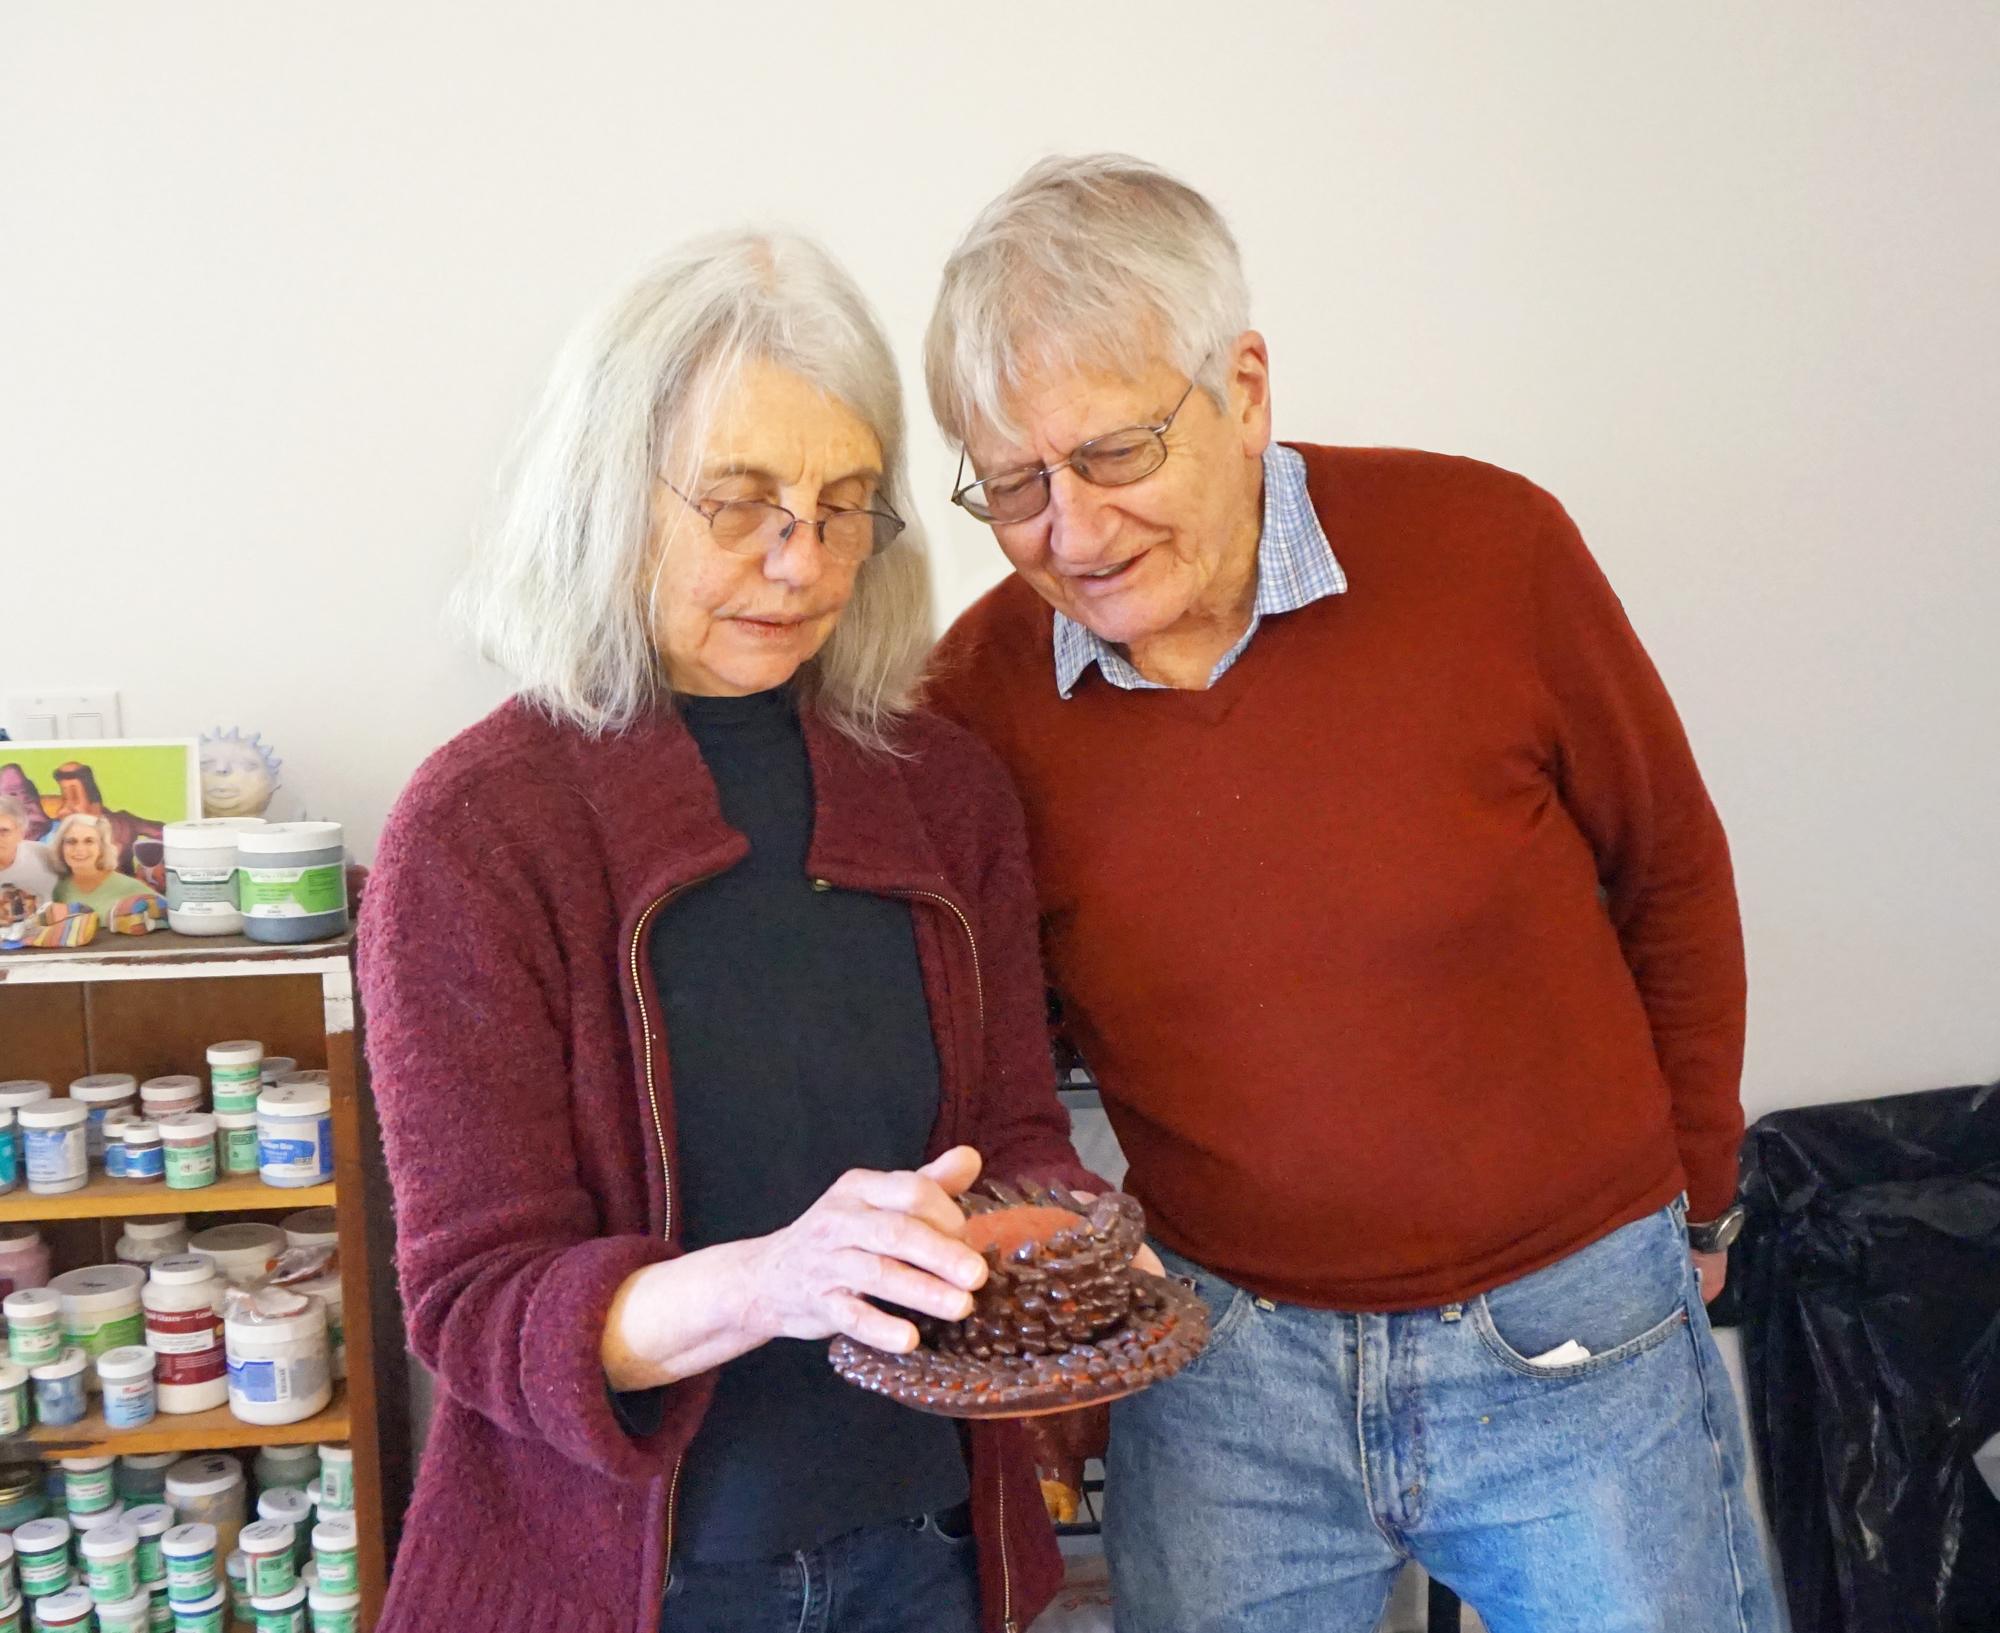 Habitat: Peter and Sally Saul in Studios in Upstate New York